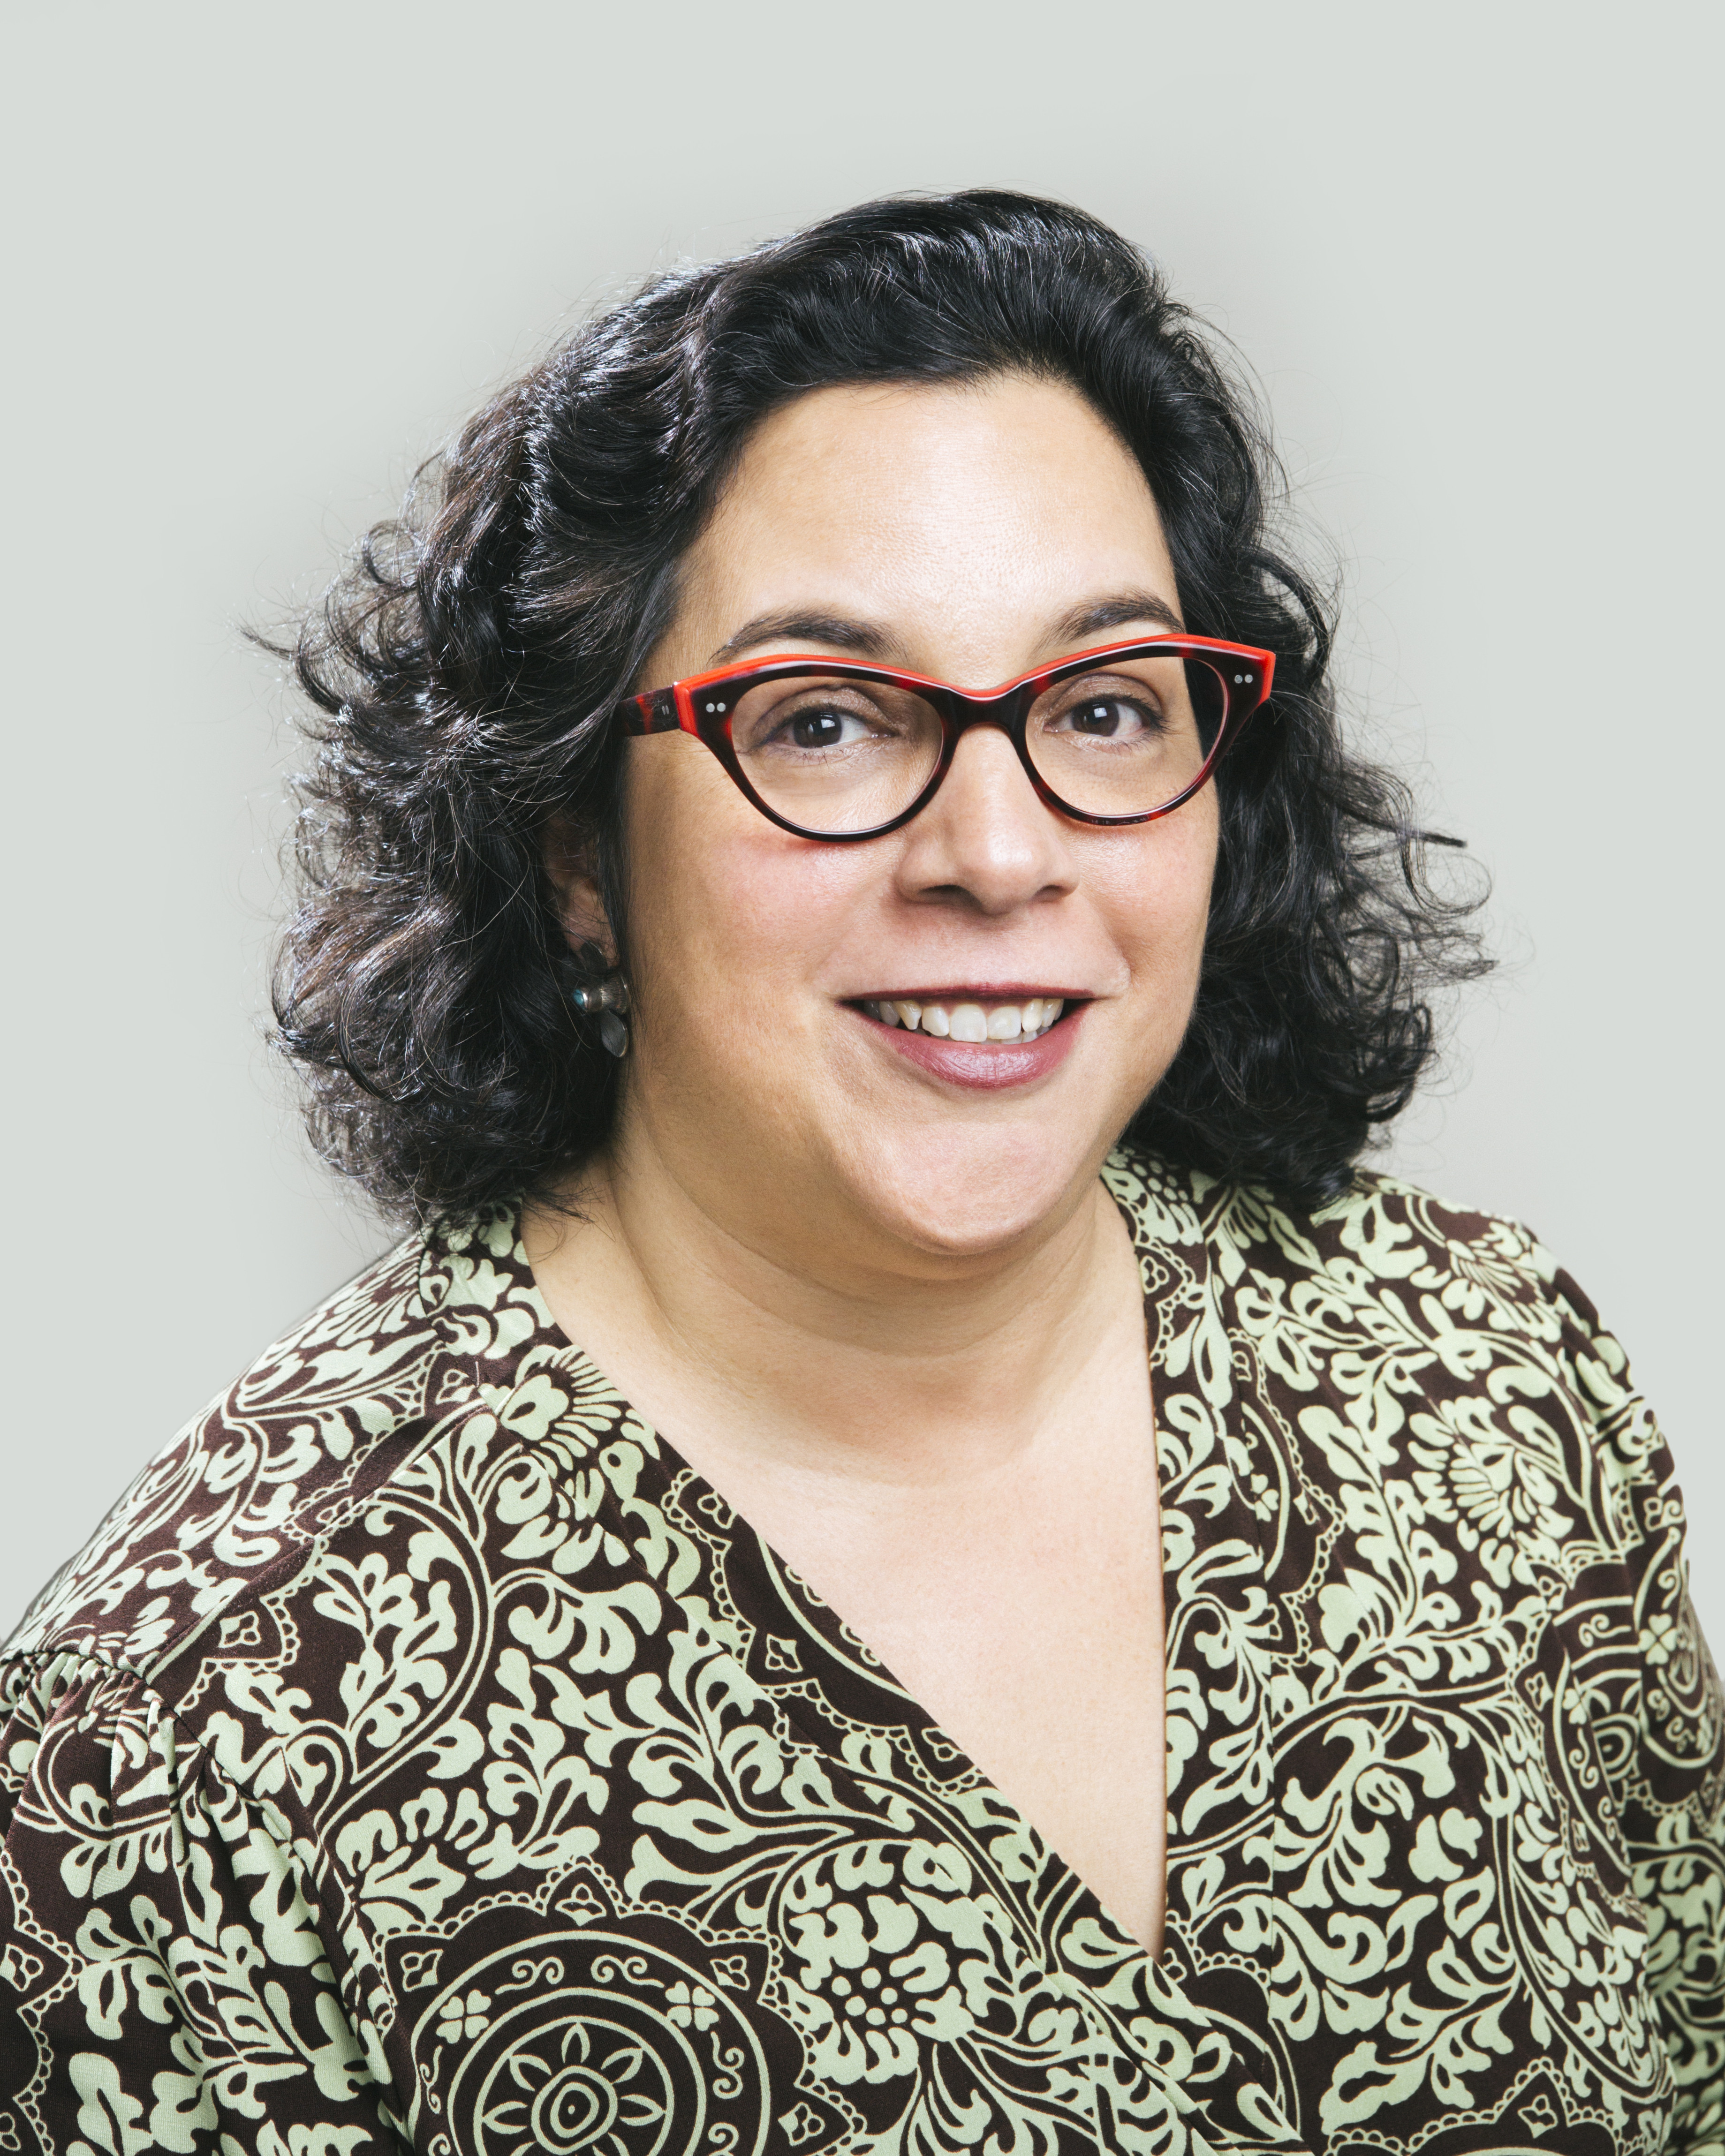 Maria Montoya: Creating Community at a Global Crossroads